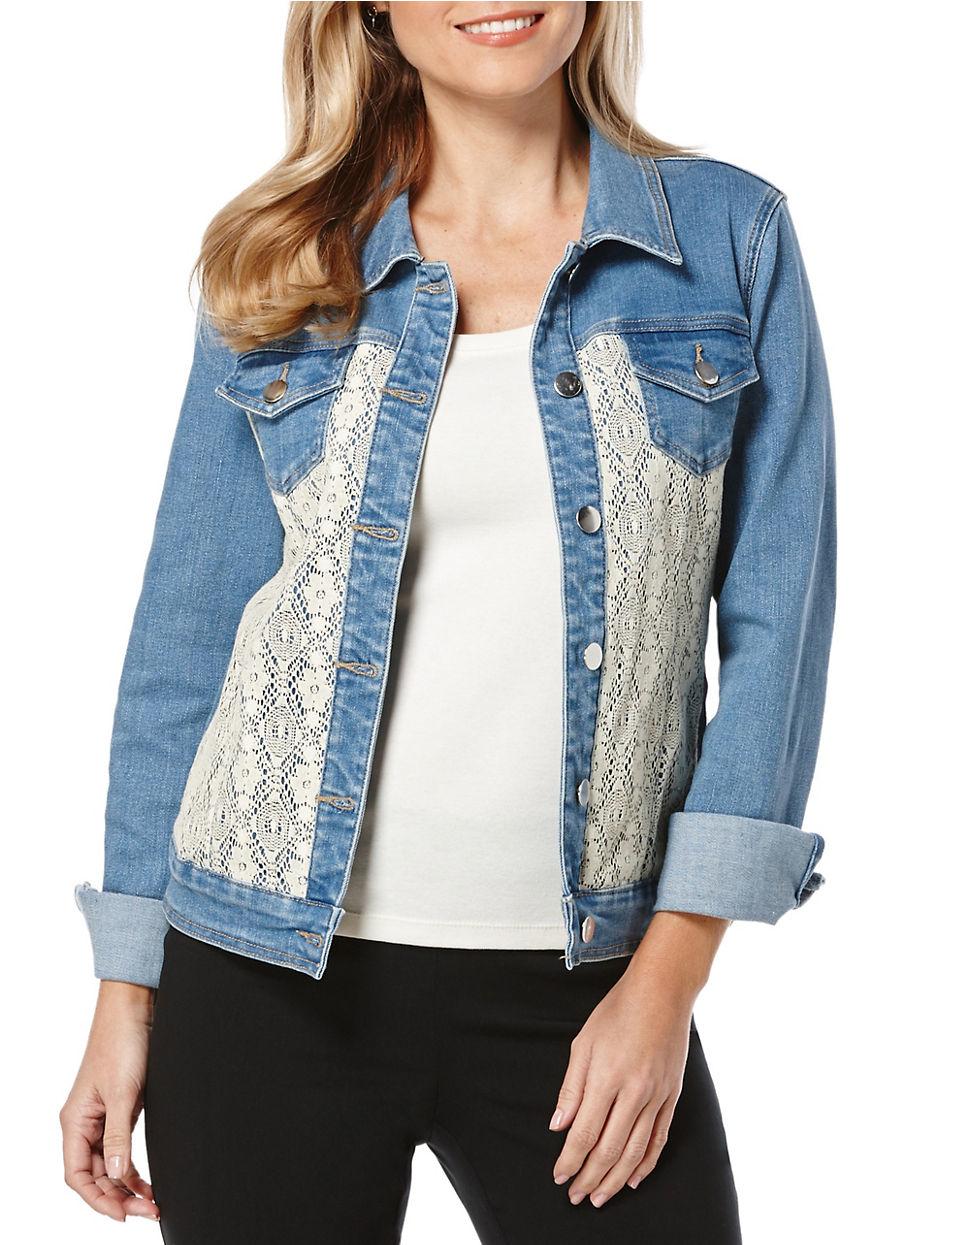 Rafaella Crocheted Lace-Paneled Denim Jacket In Blue - Lyst-4720